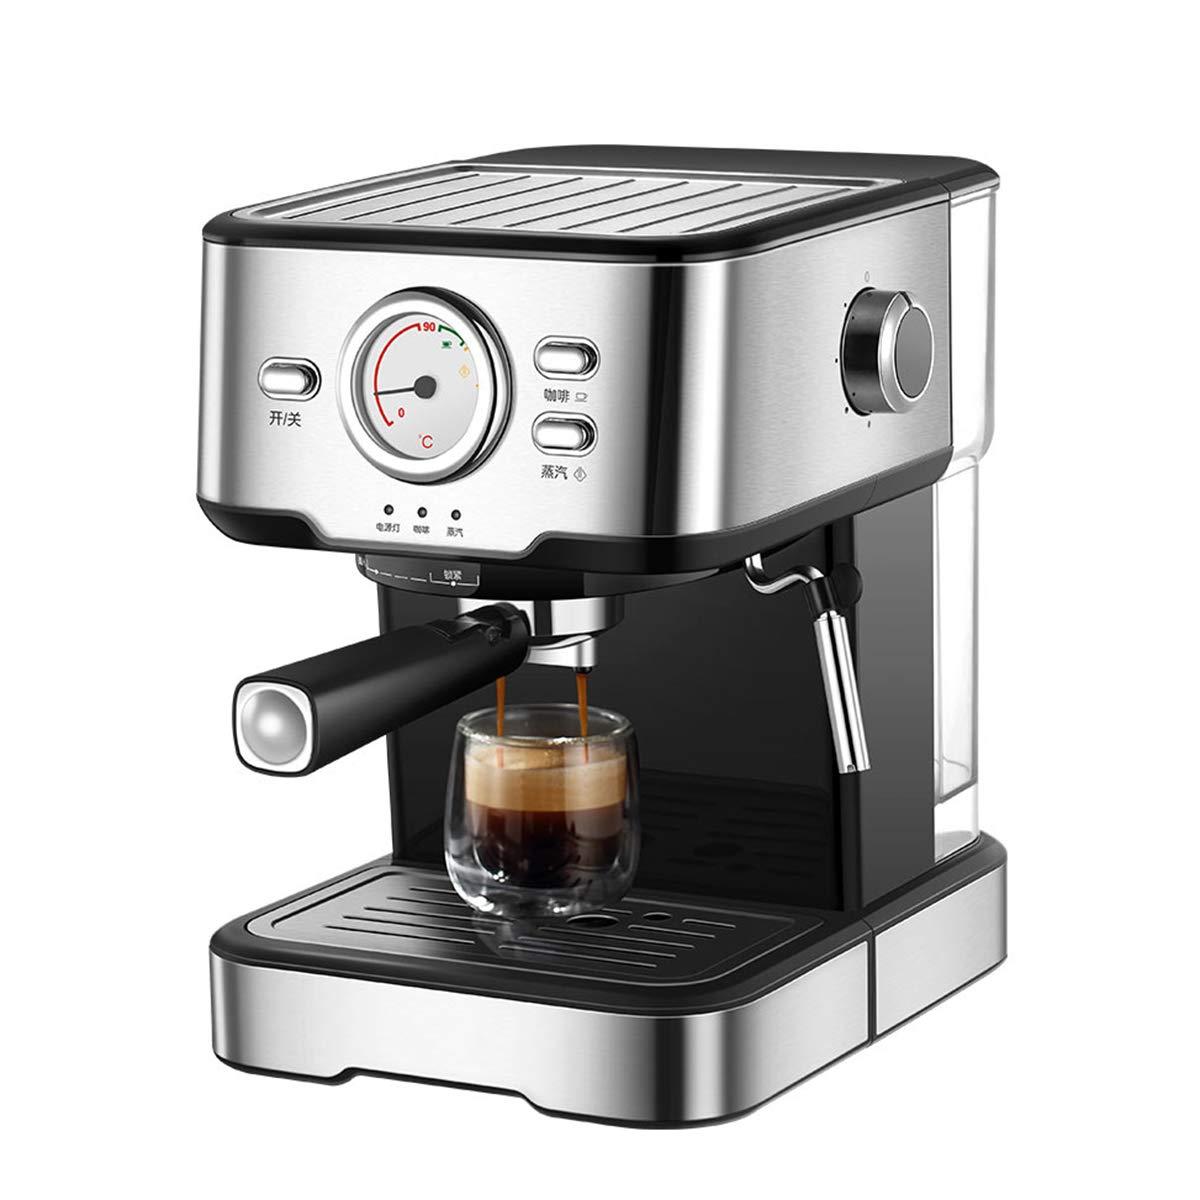 LTLWSH Cafetera Espresso, con Filtro de Agua 1050 W de Potencia Presión de 20 Bares Depósito de Agua de 1,5 litros, Boquilla de Vapor Termómetro Colador: Amazon.es: Hogar